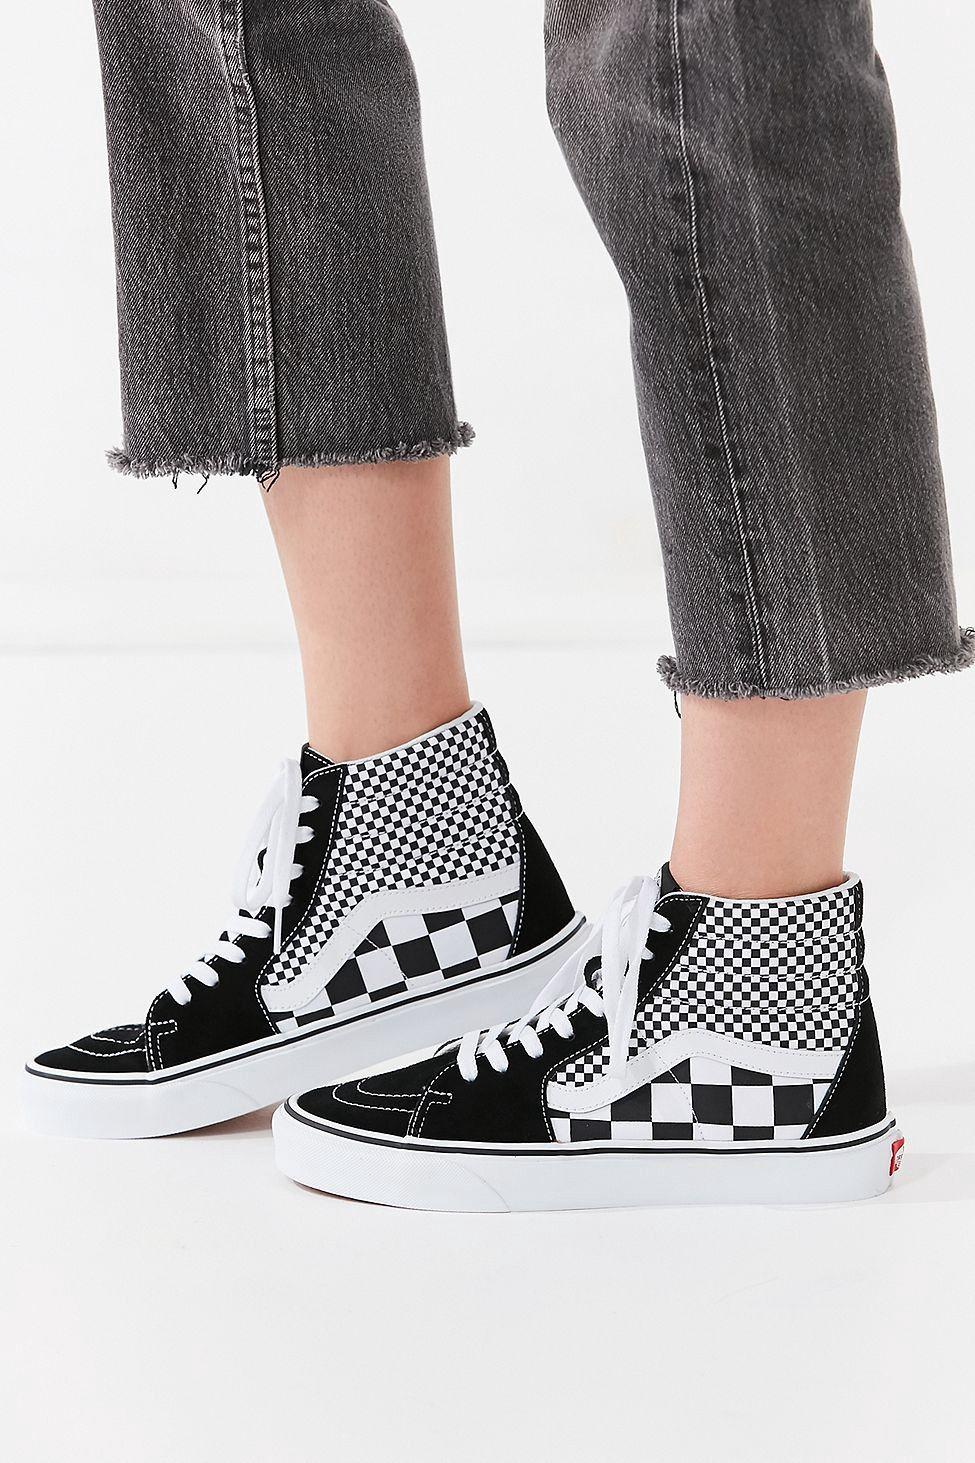 Urban Outfitters Vans Mix Checkerboard Sk8-Hi Sneaker - Black + White 15683af71